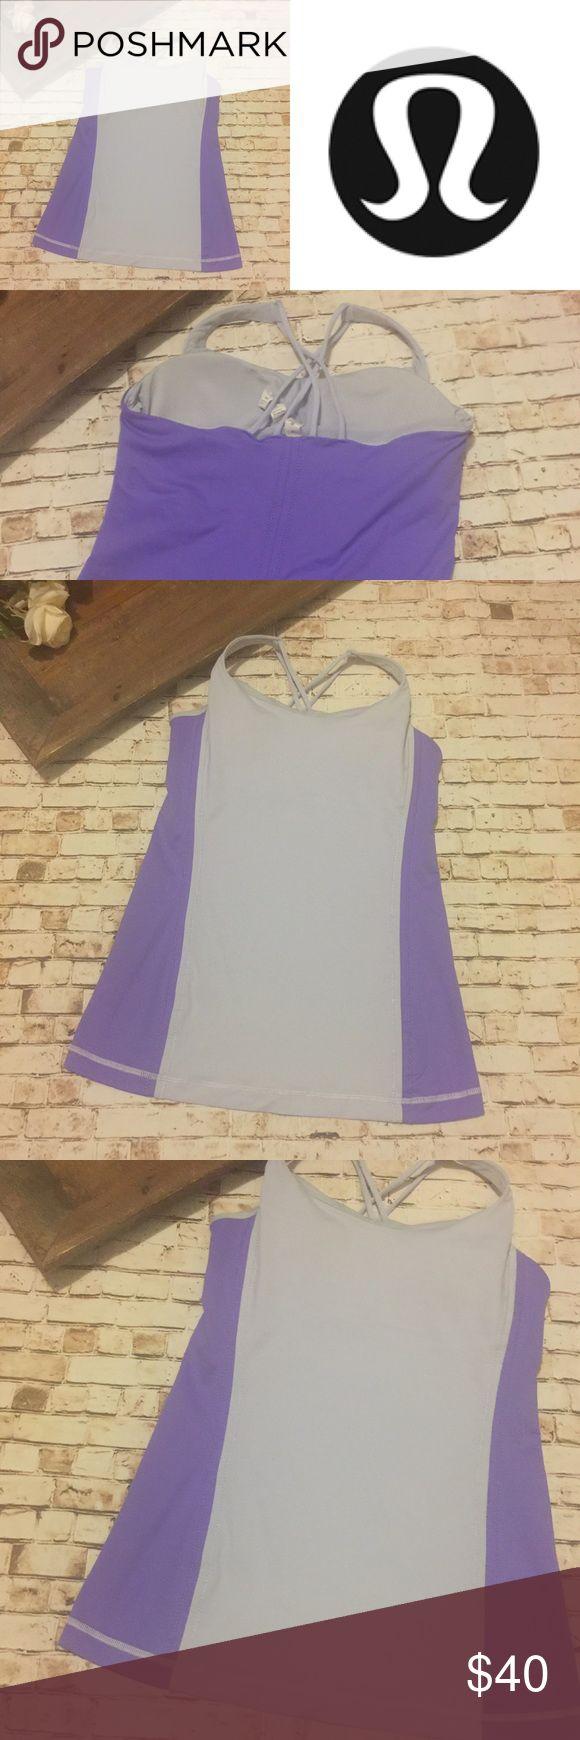 Lululemon purple gray strappy tank top Shelf bra. Strappy back. Padded cups. lululemon athletica Tops Tank Tops